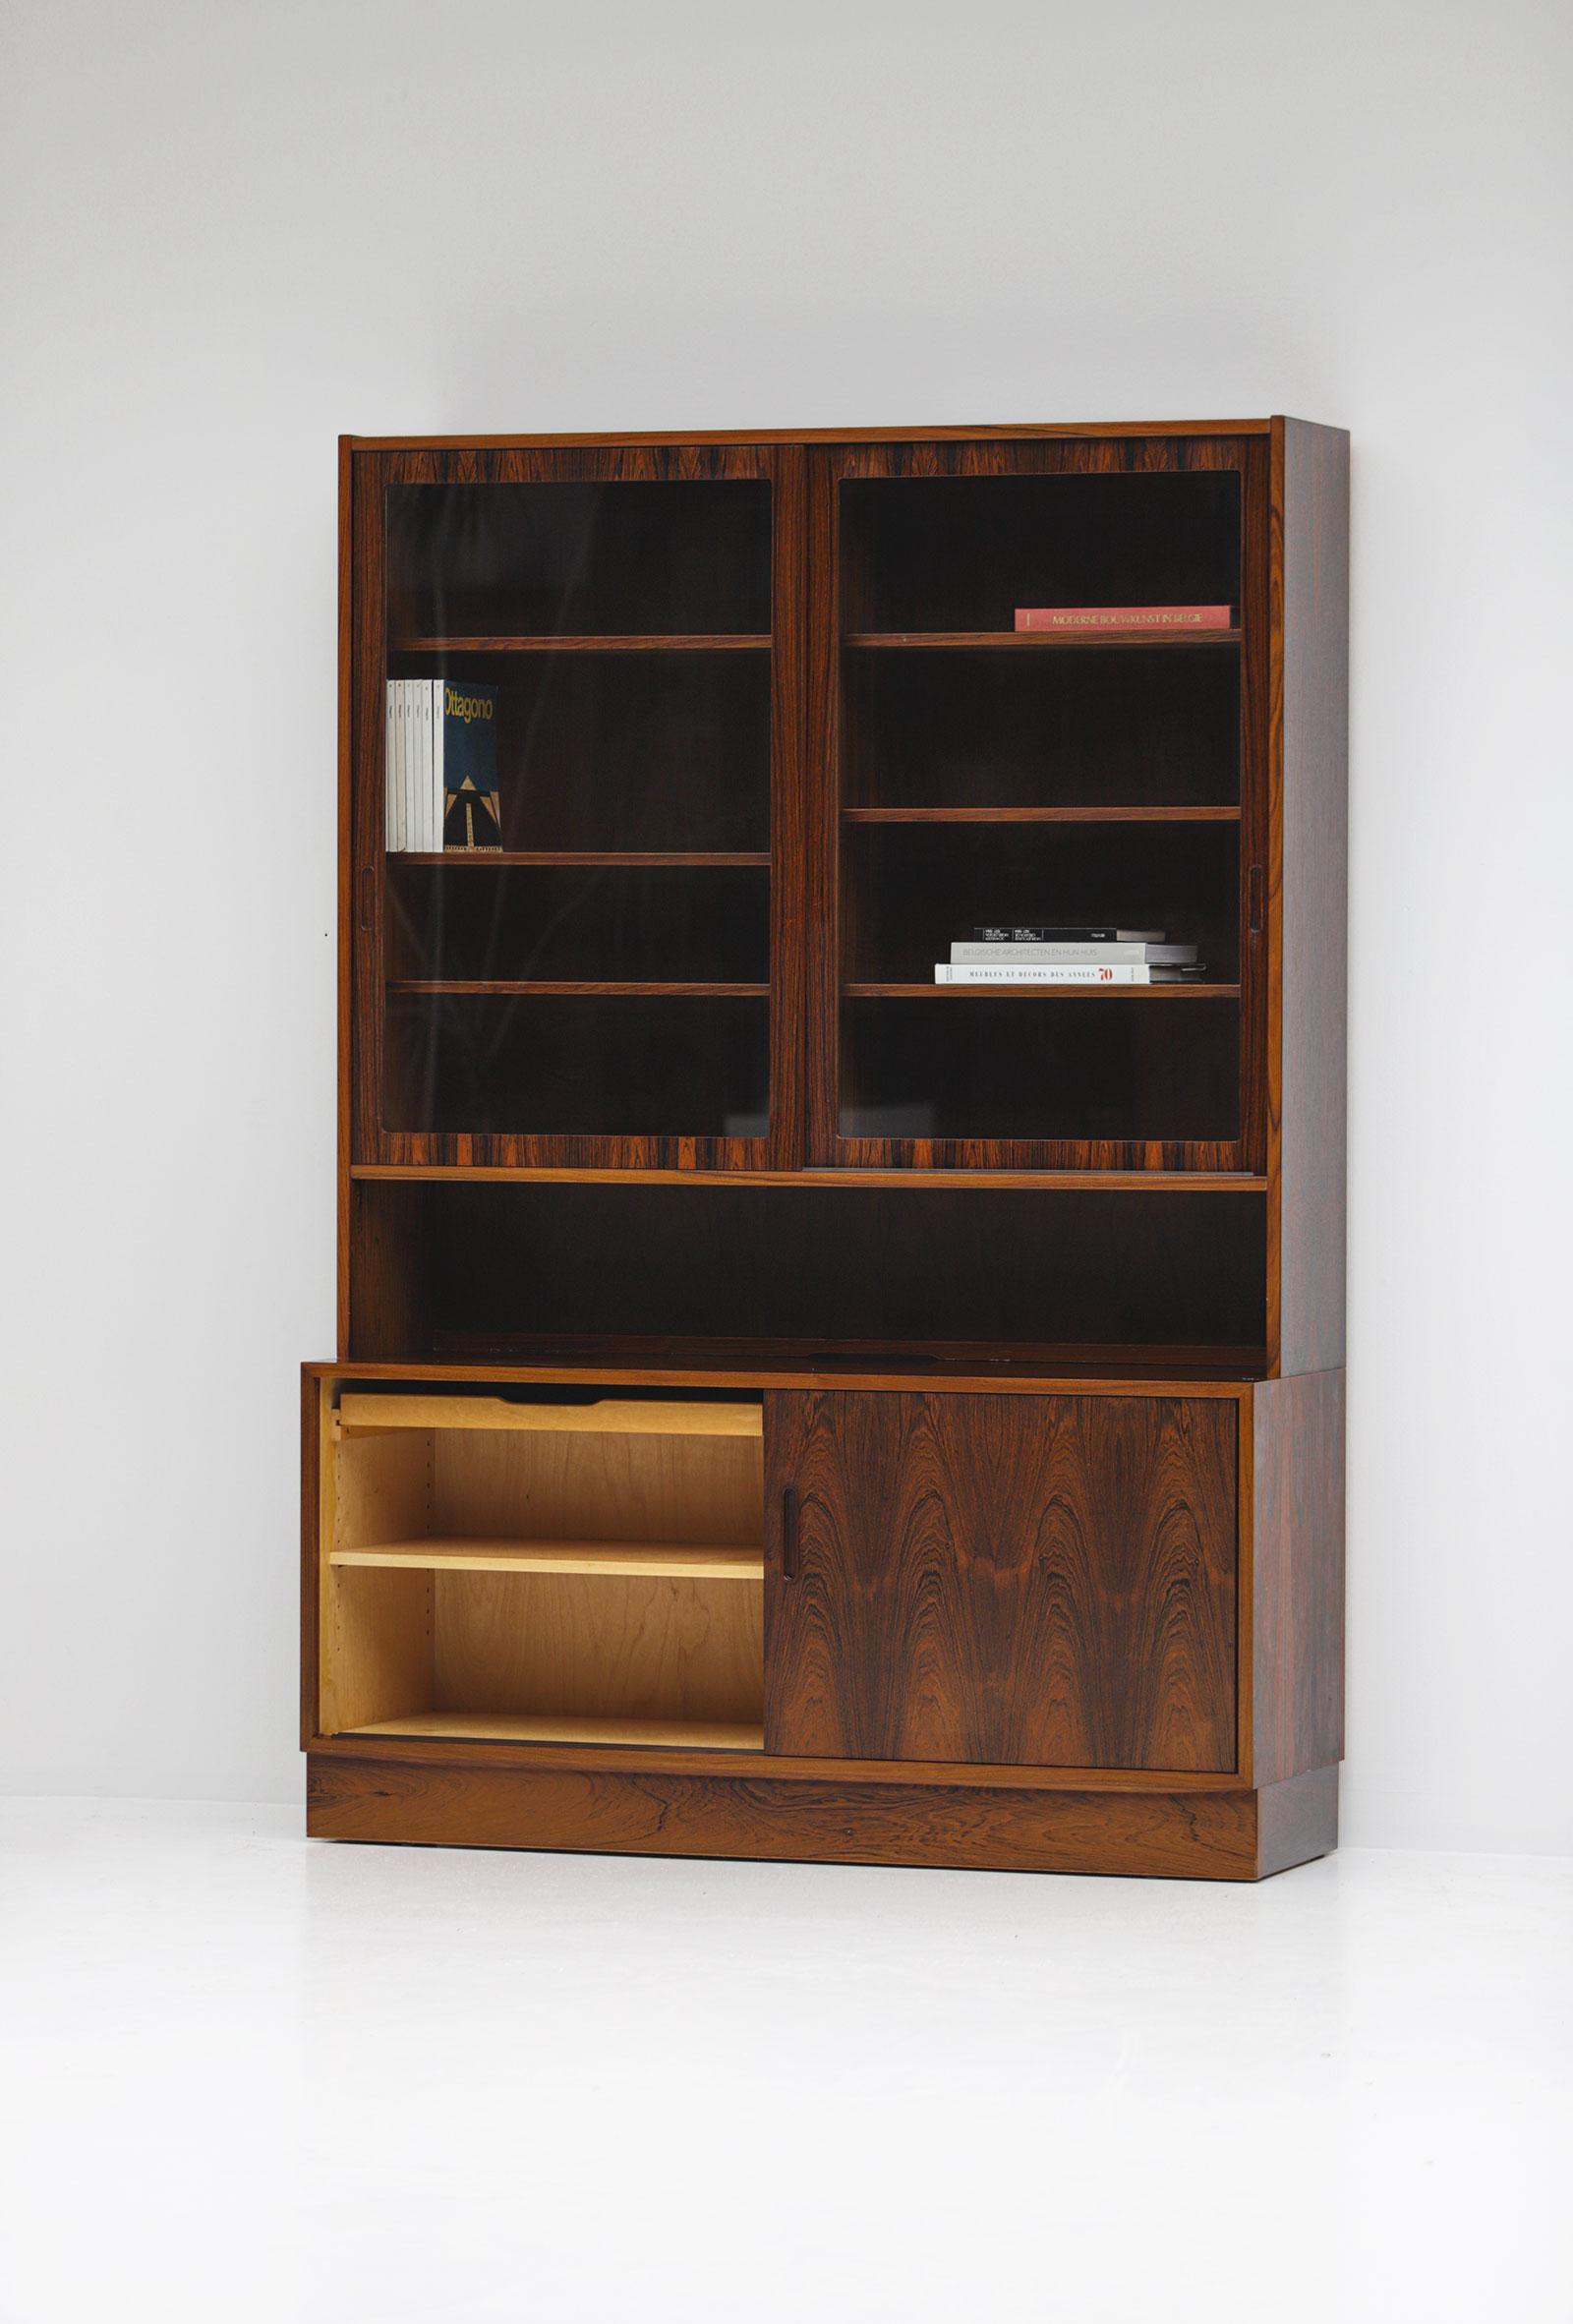 cabinet by Erik Brouer for Mobelfabrik 1960image 4